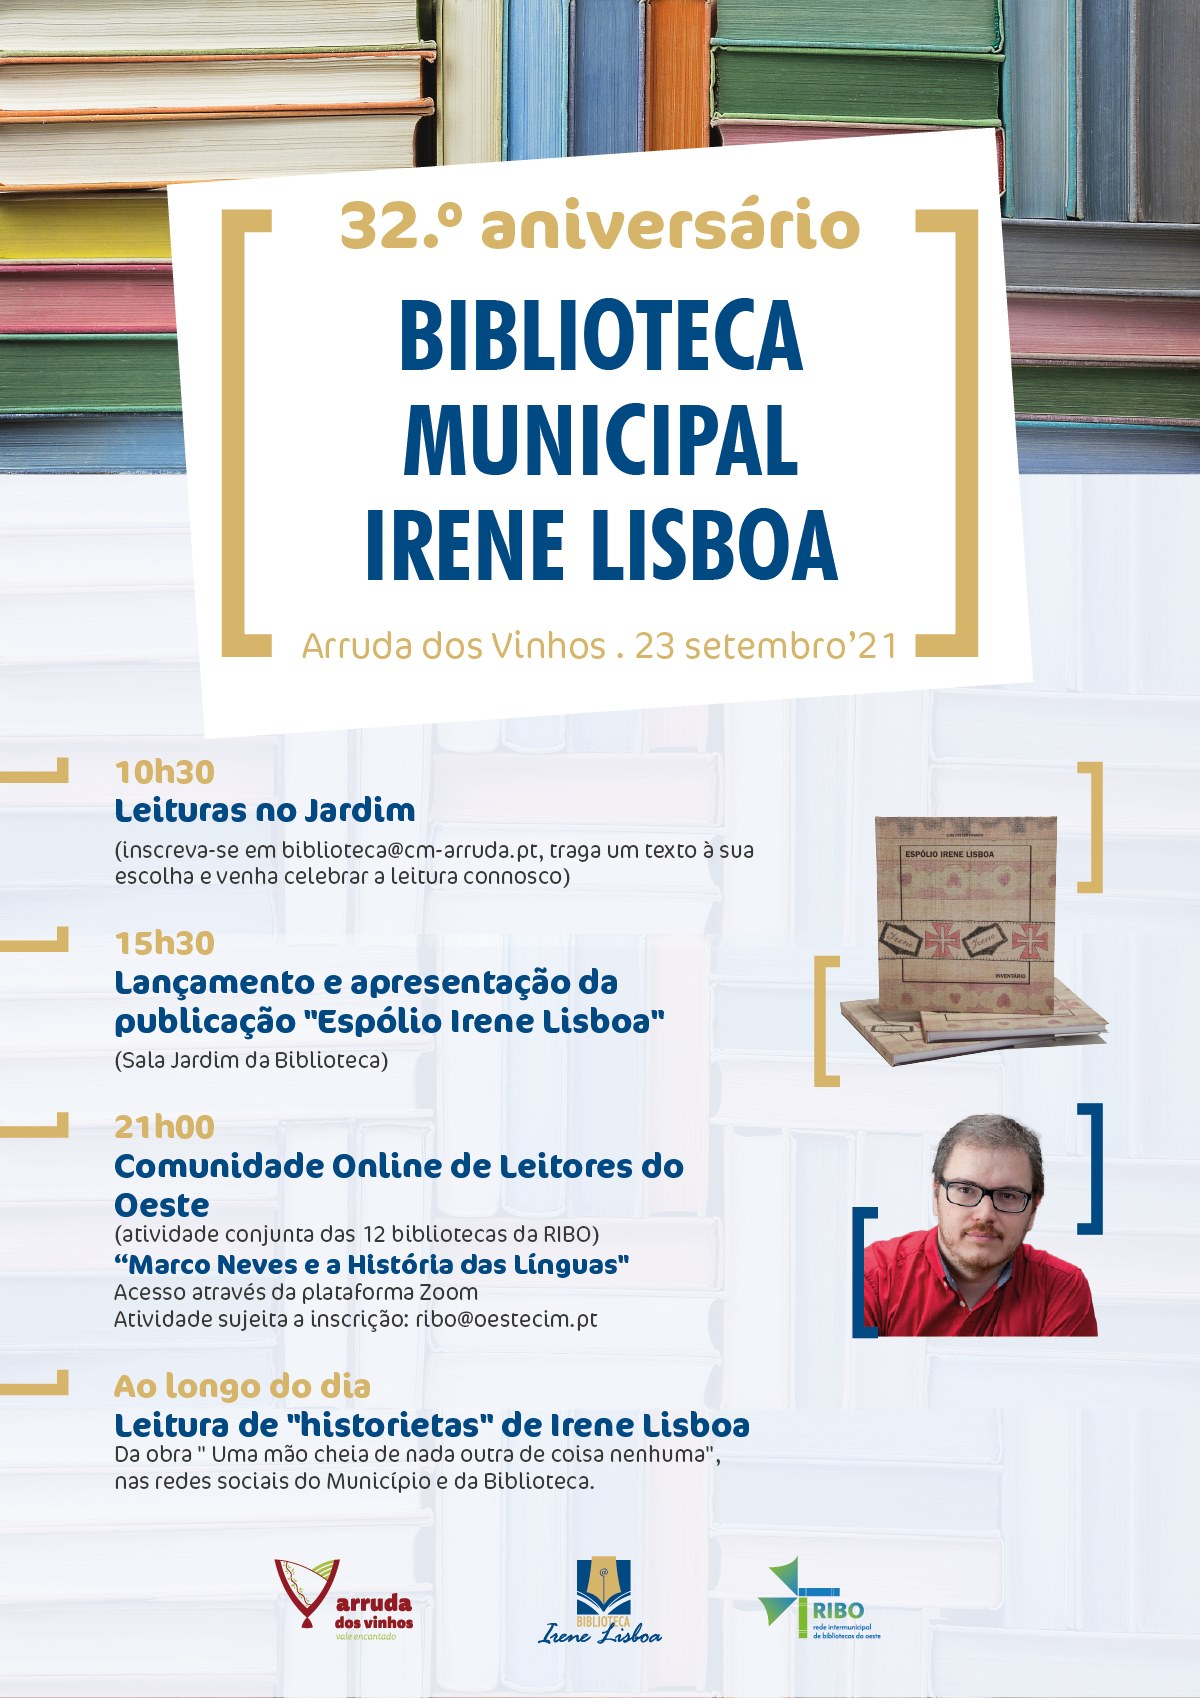 32.º aniversário da Biblioteca Municipal Irene Lisboa